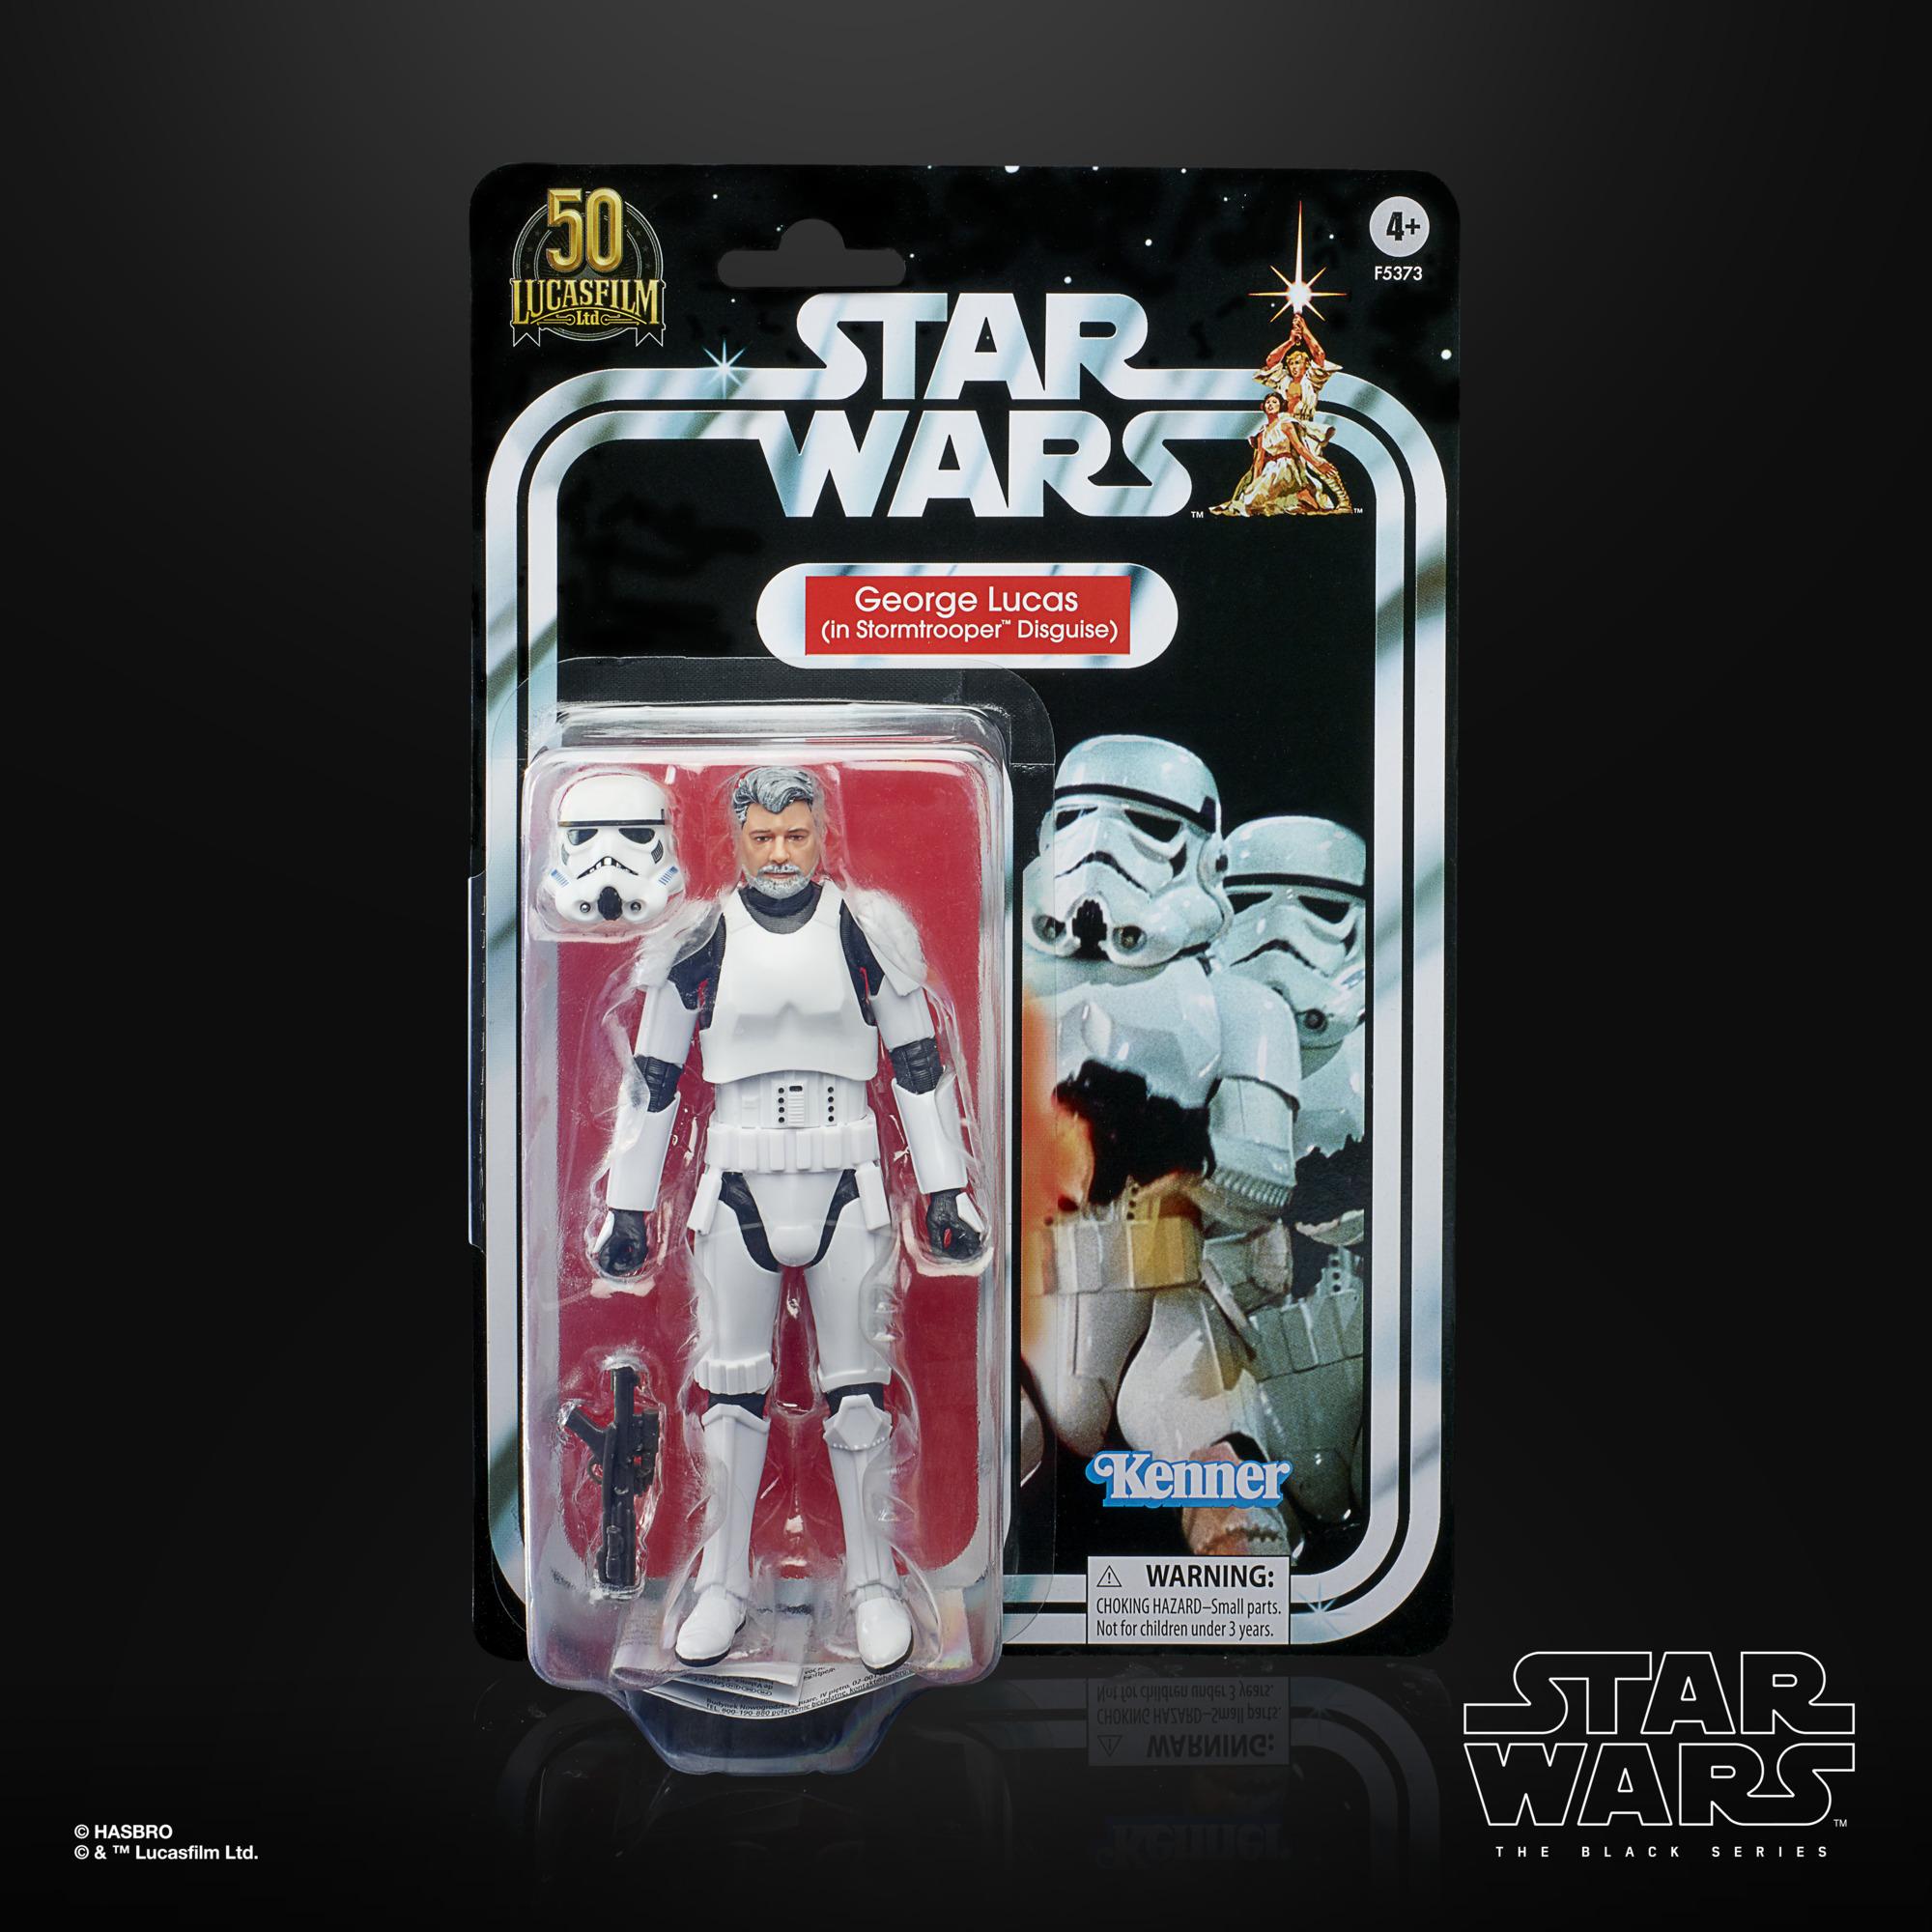 Star Wars The Black Series George Lucas (In Stormtrooper Disguise) F53735L00 5010993954247